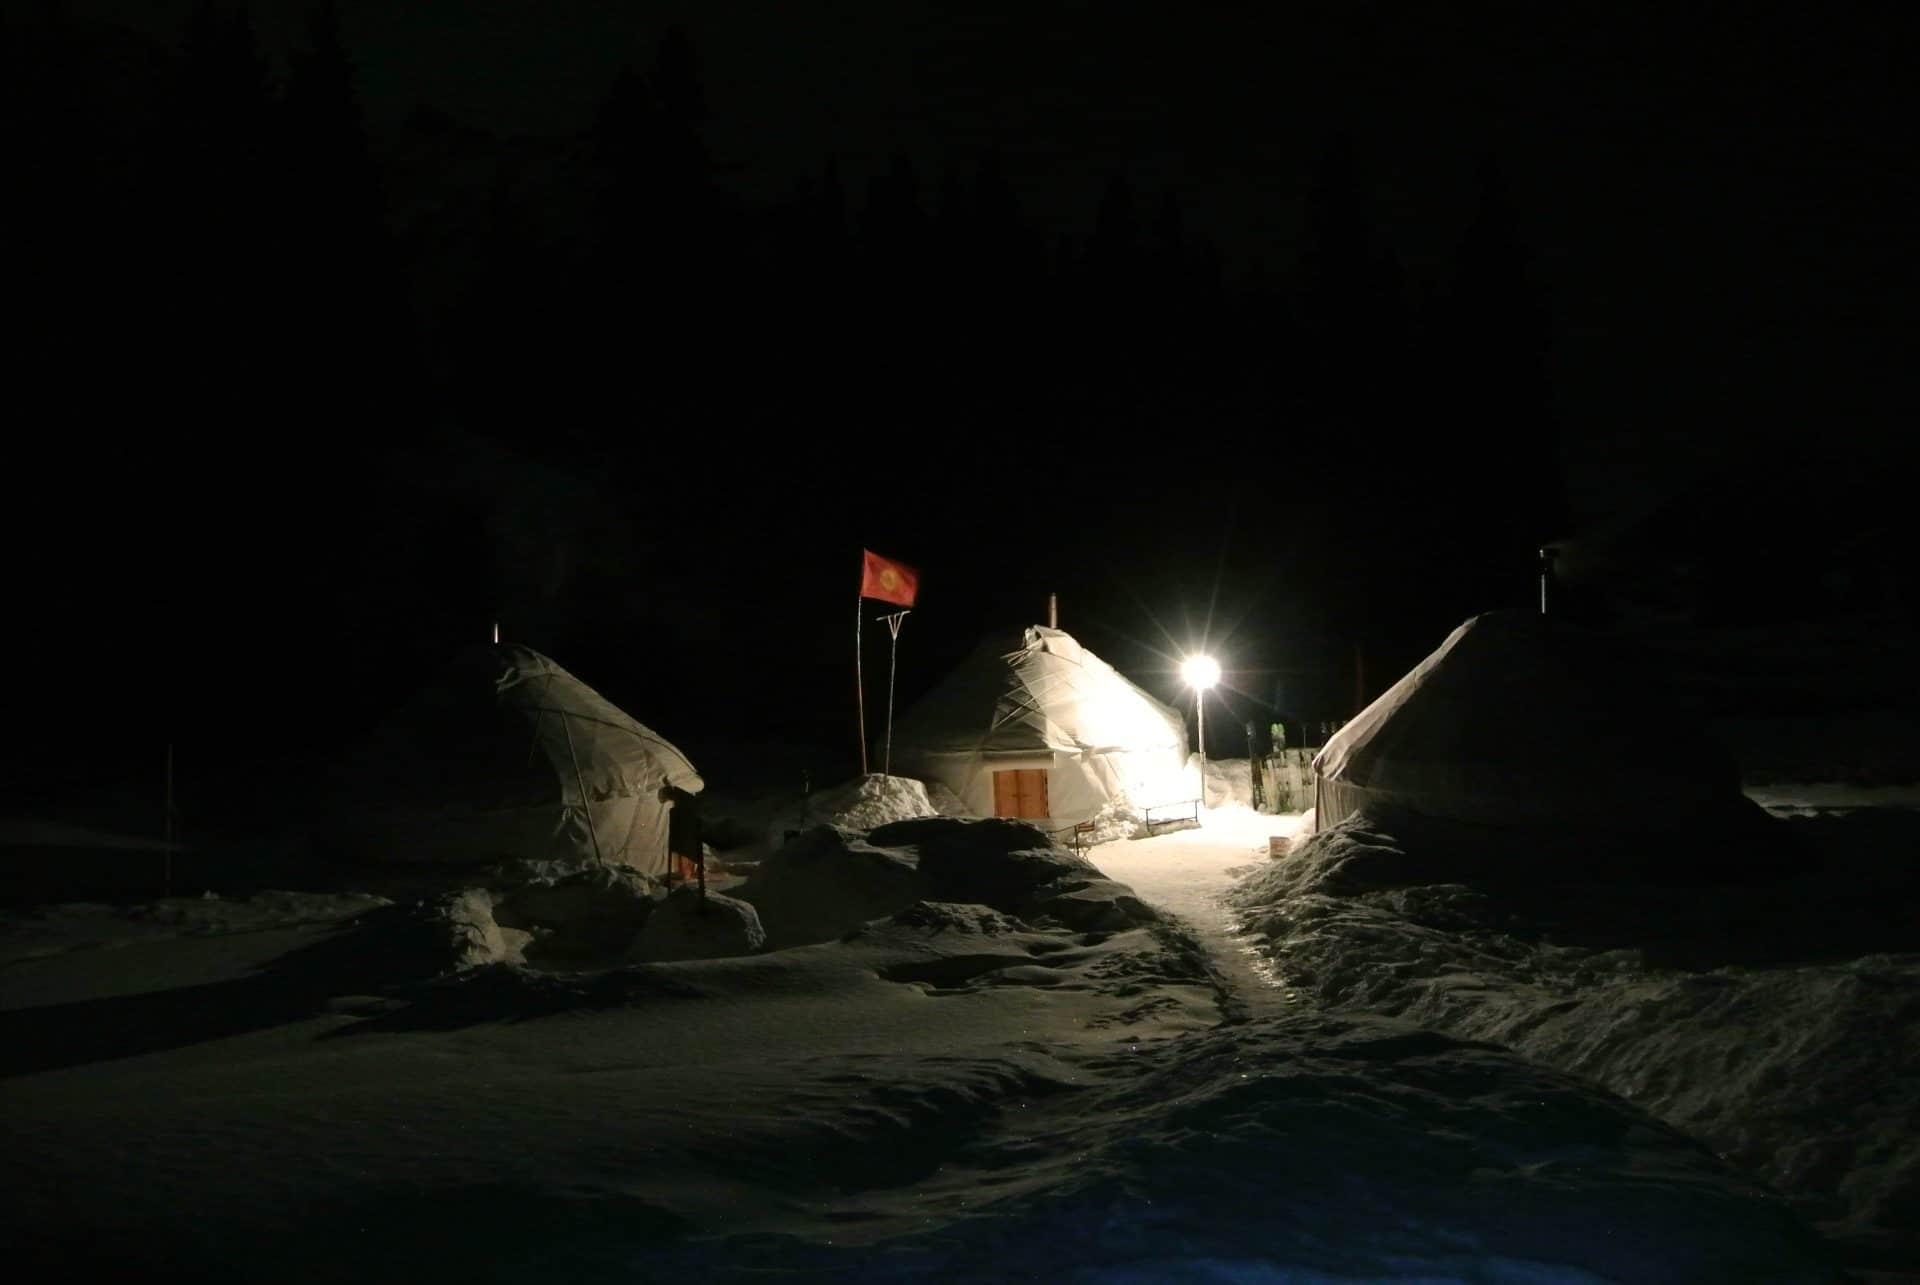 Helyum_Xavier-Carrard_Guide-de-montagne_Ski_Voyage_Kirghistan_Asie-Centrale_Camp_Yourtes